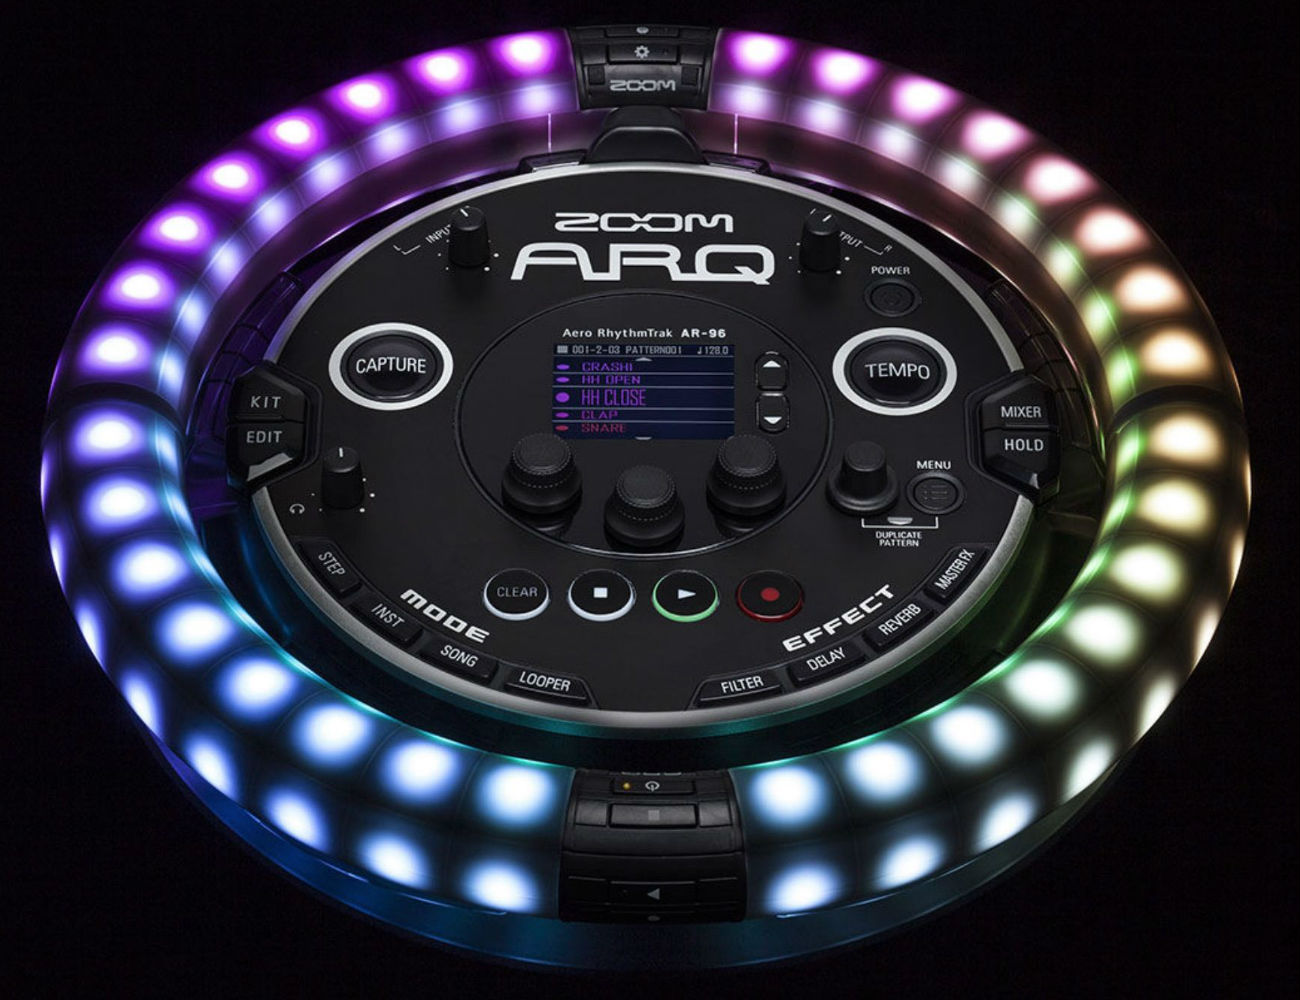 zoom-arq-aero-rhythmtrak-02